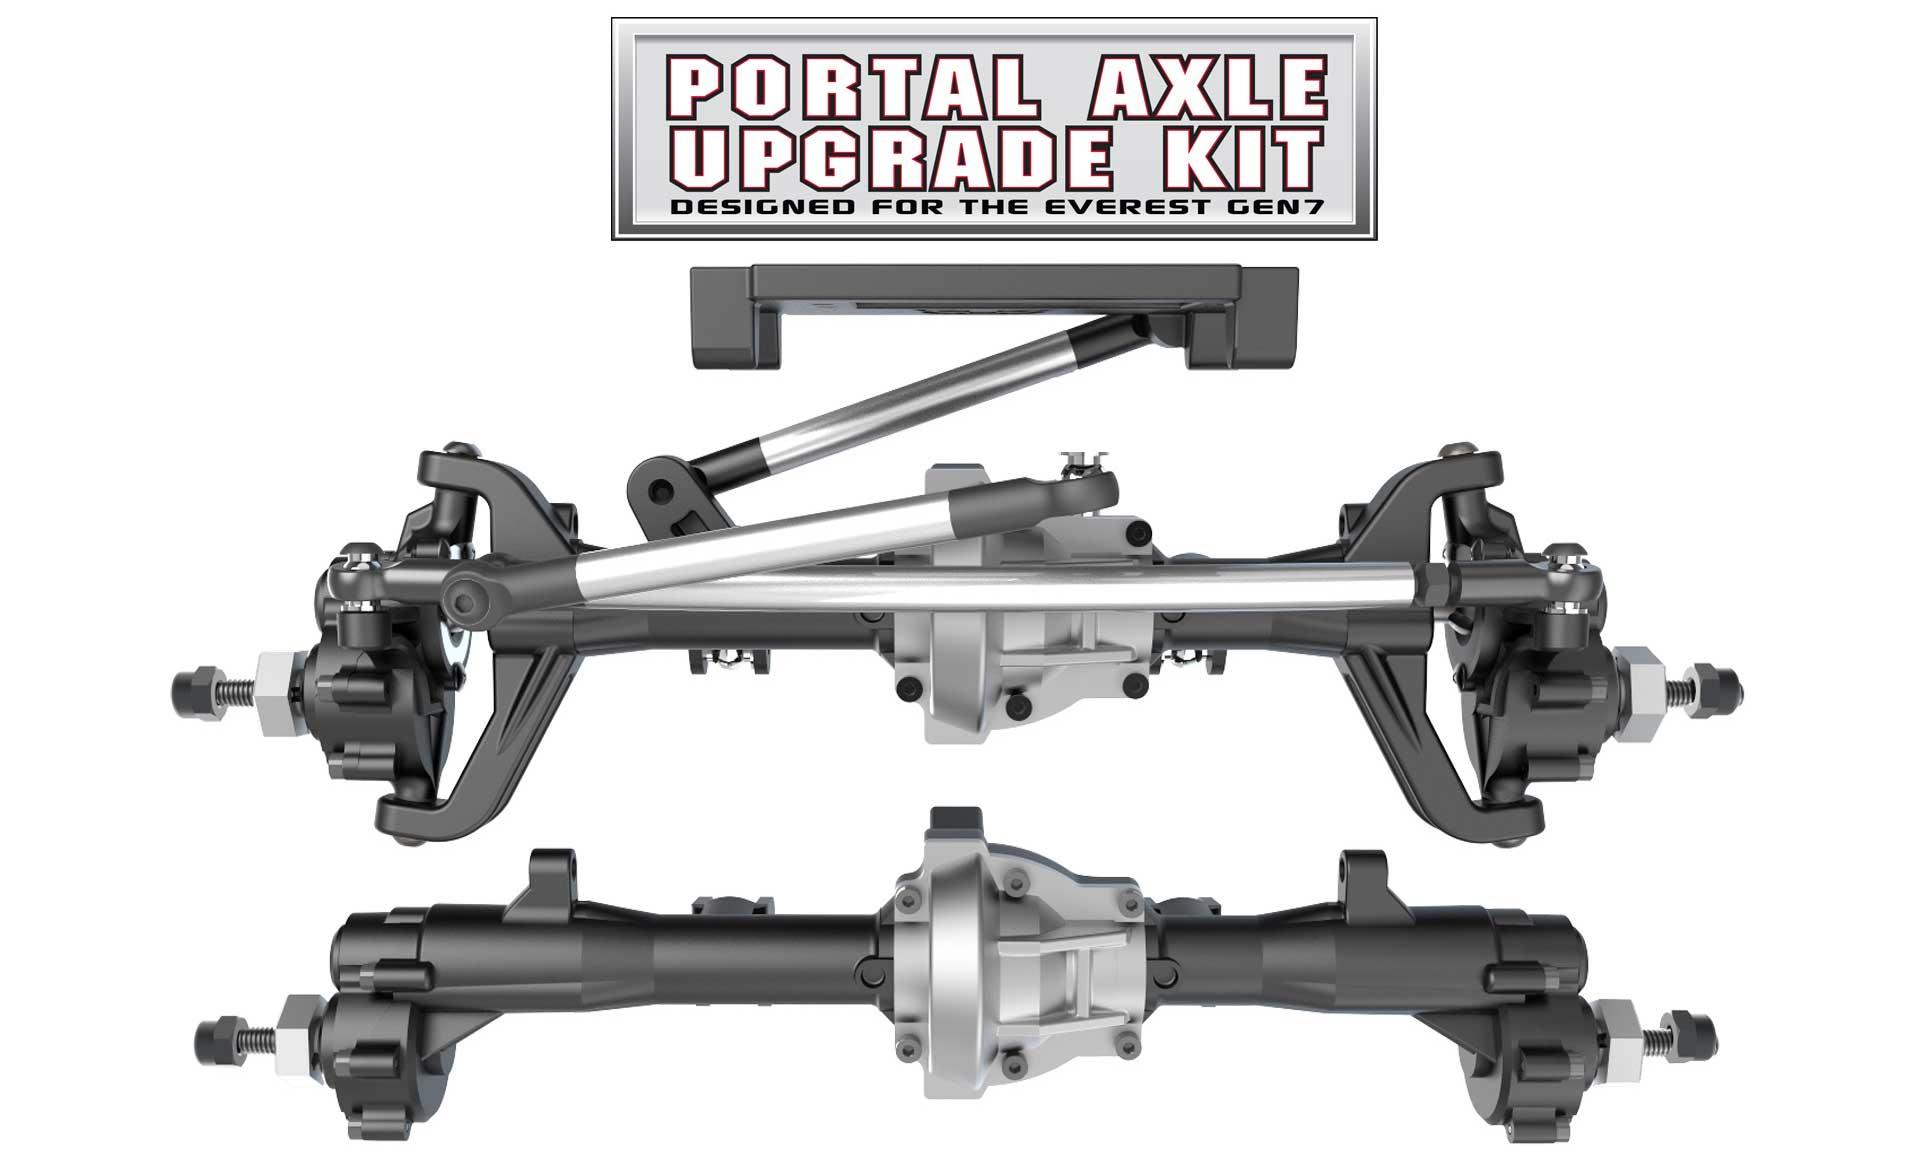 Redcat Racing Everest GEN7 Portal Axle Upgrade Kit - Large View